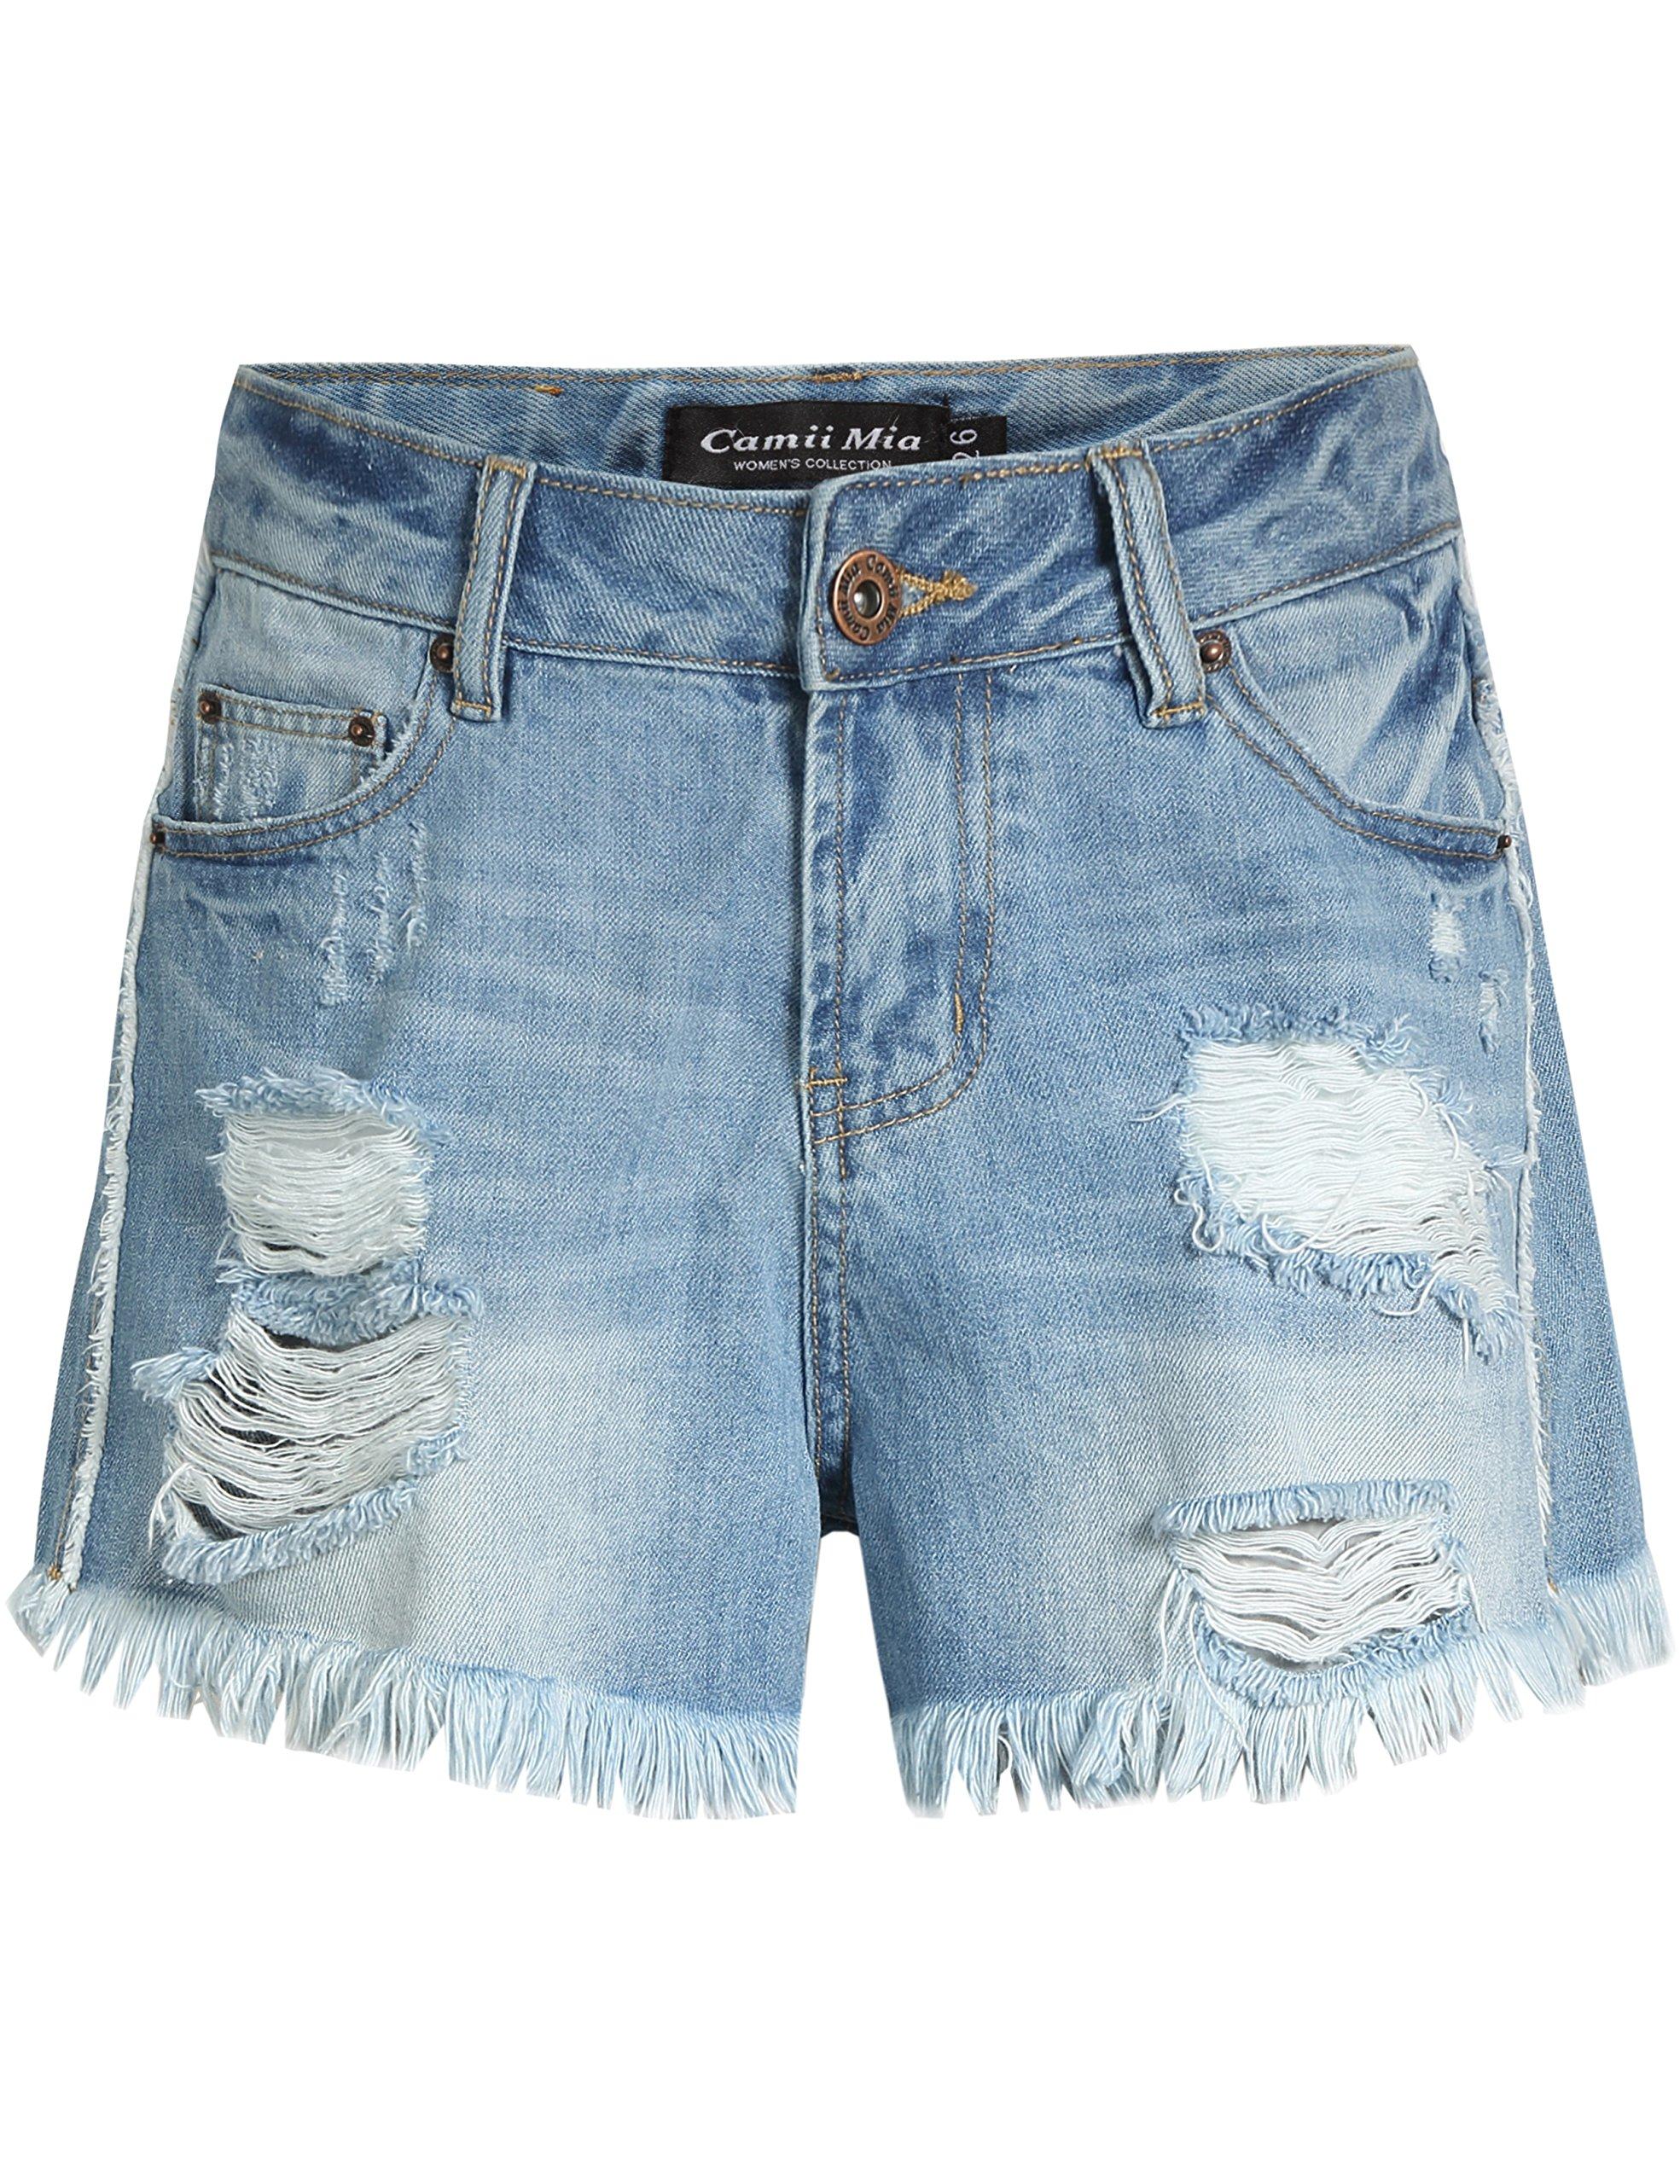 Camii Mia Women's Distressed Mid Rise Denim Shorts (32, Light Blue)